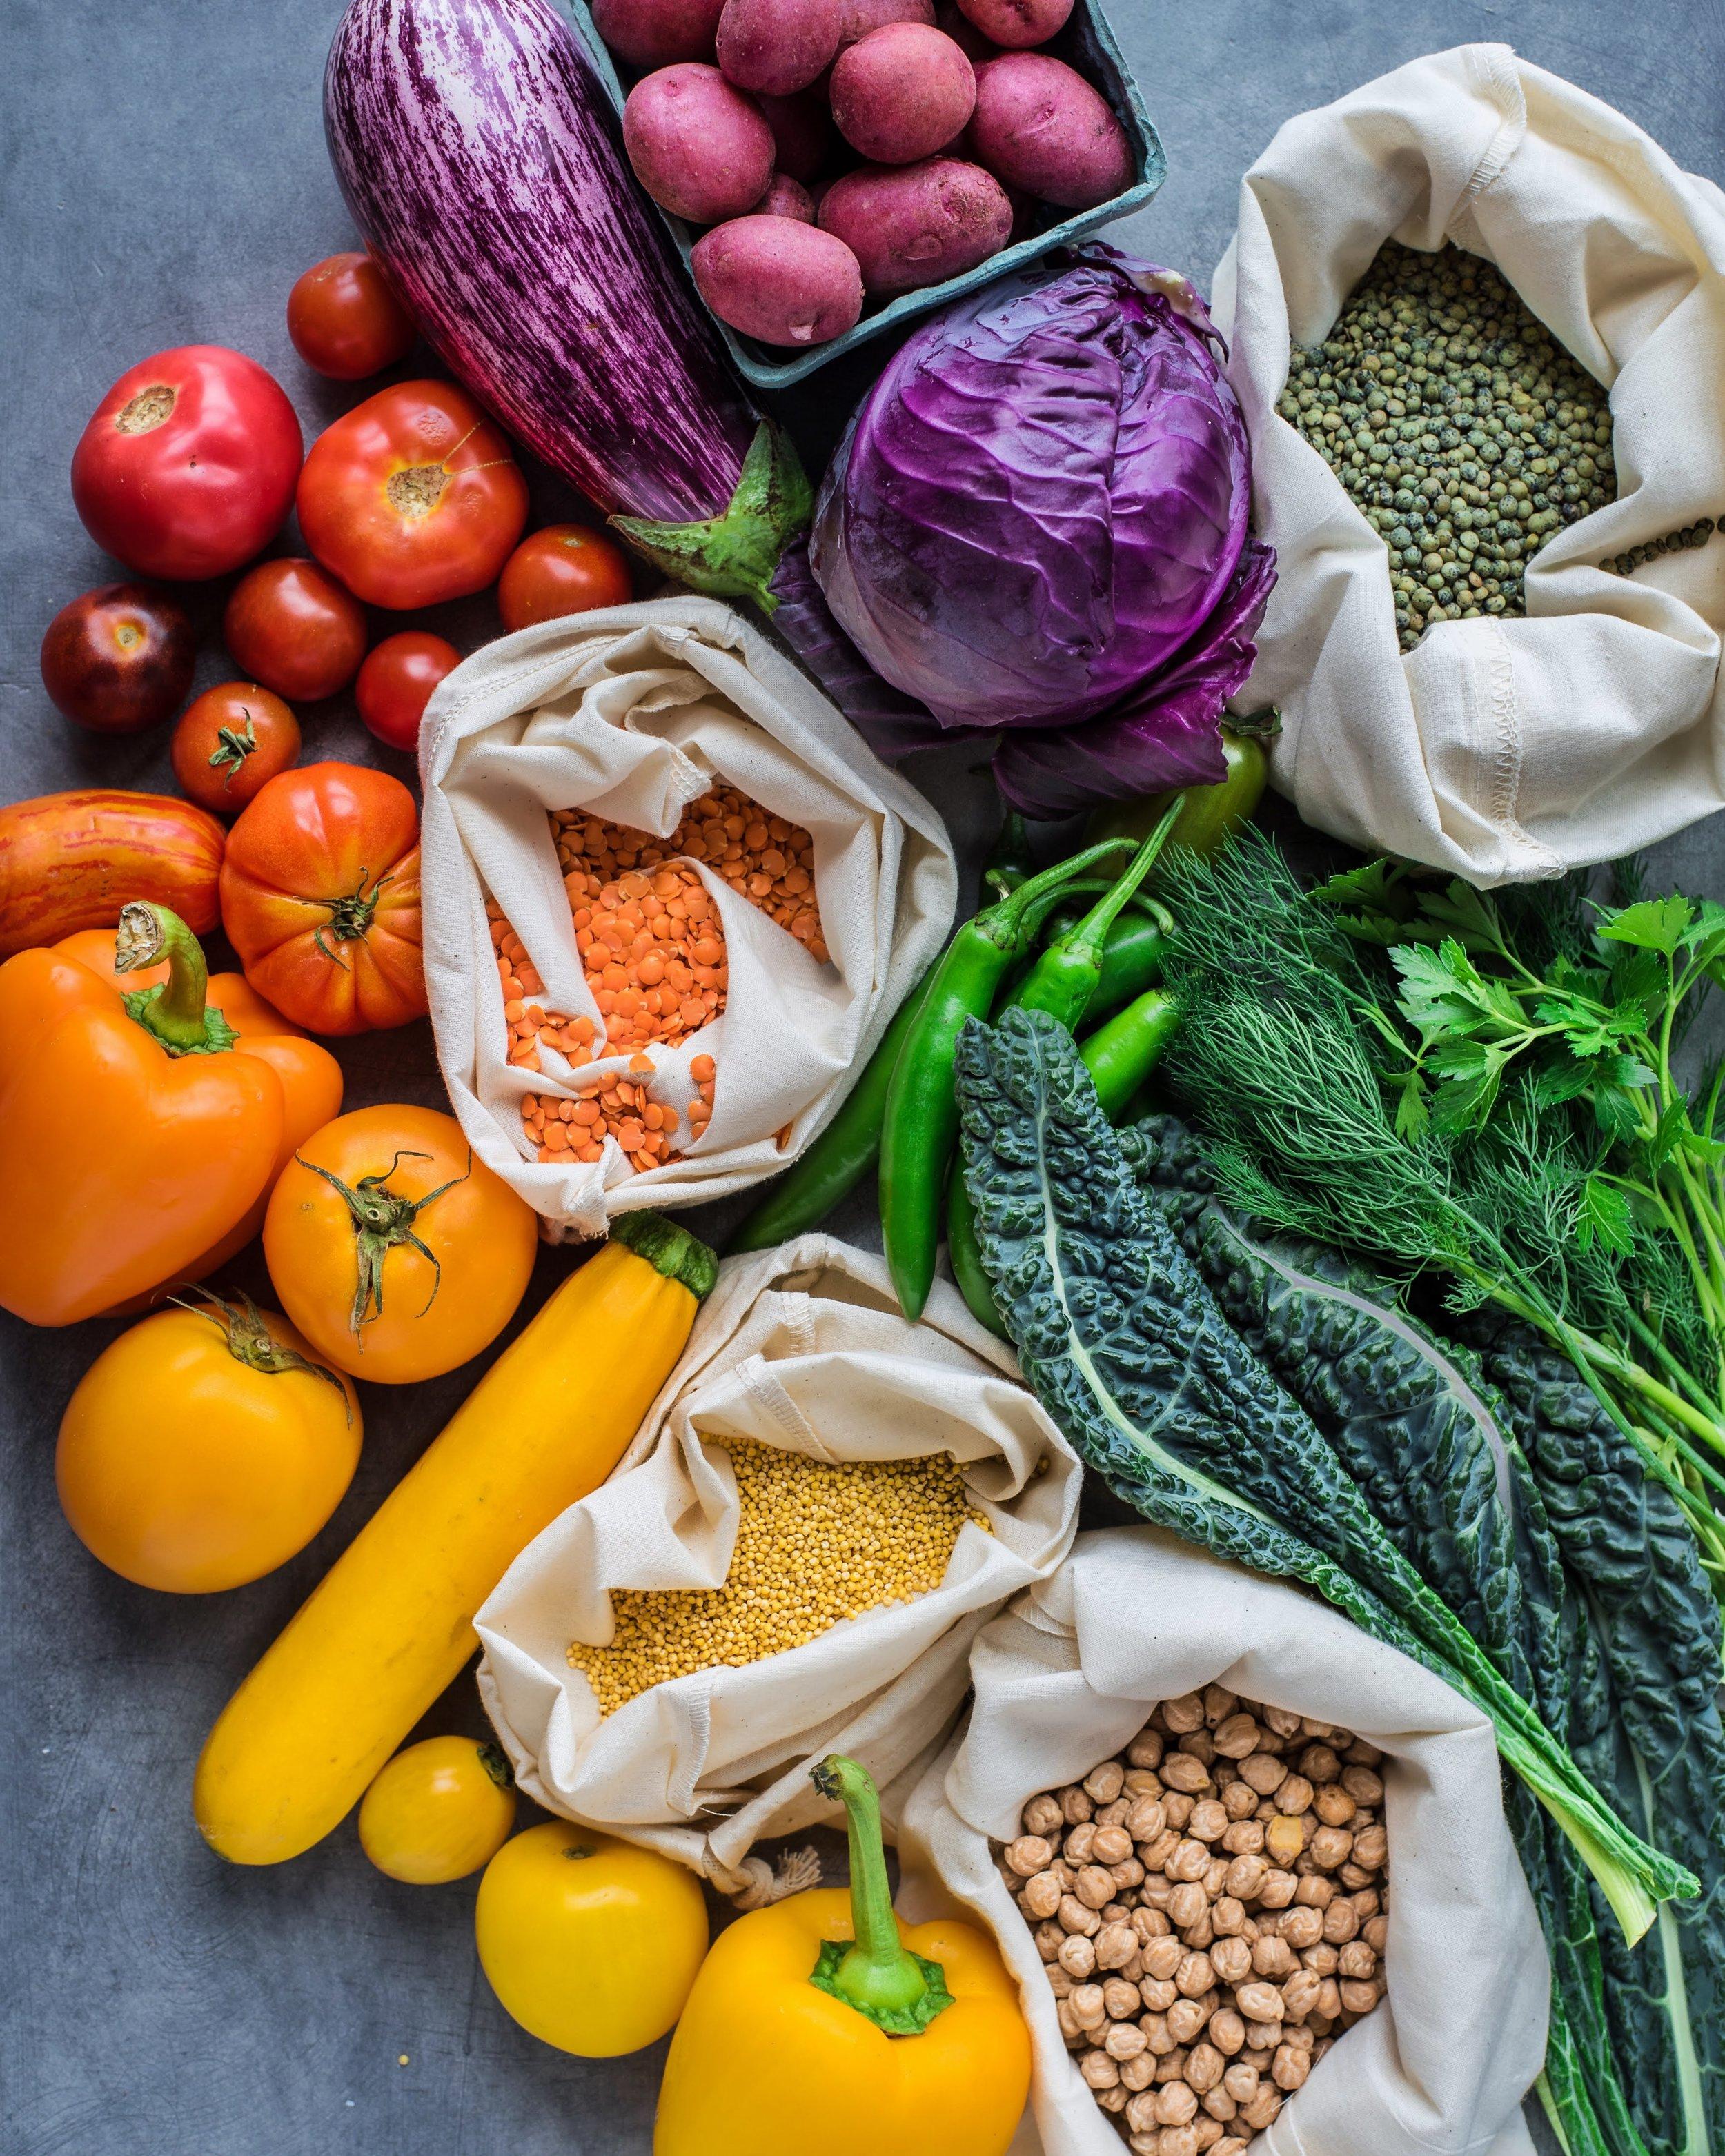 7-day vegan challenge